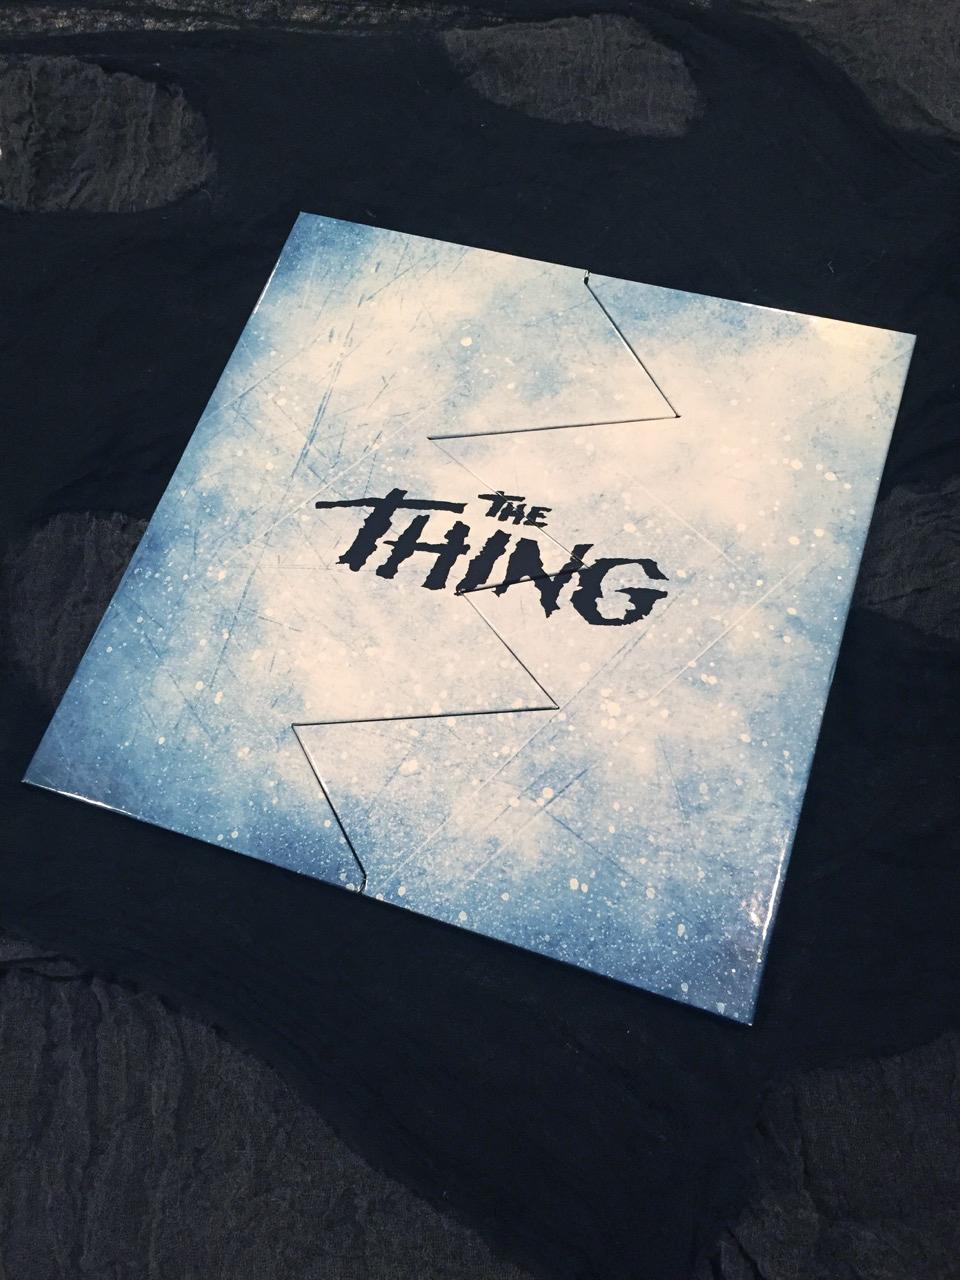 Waxwork Records Quot The Thing Quot Deluxe Vinyl Soundtrack